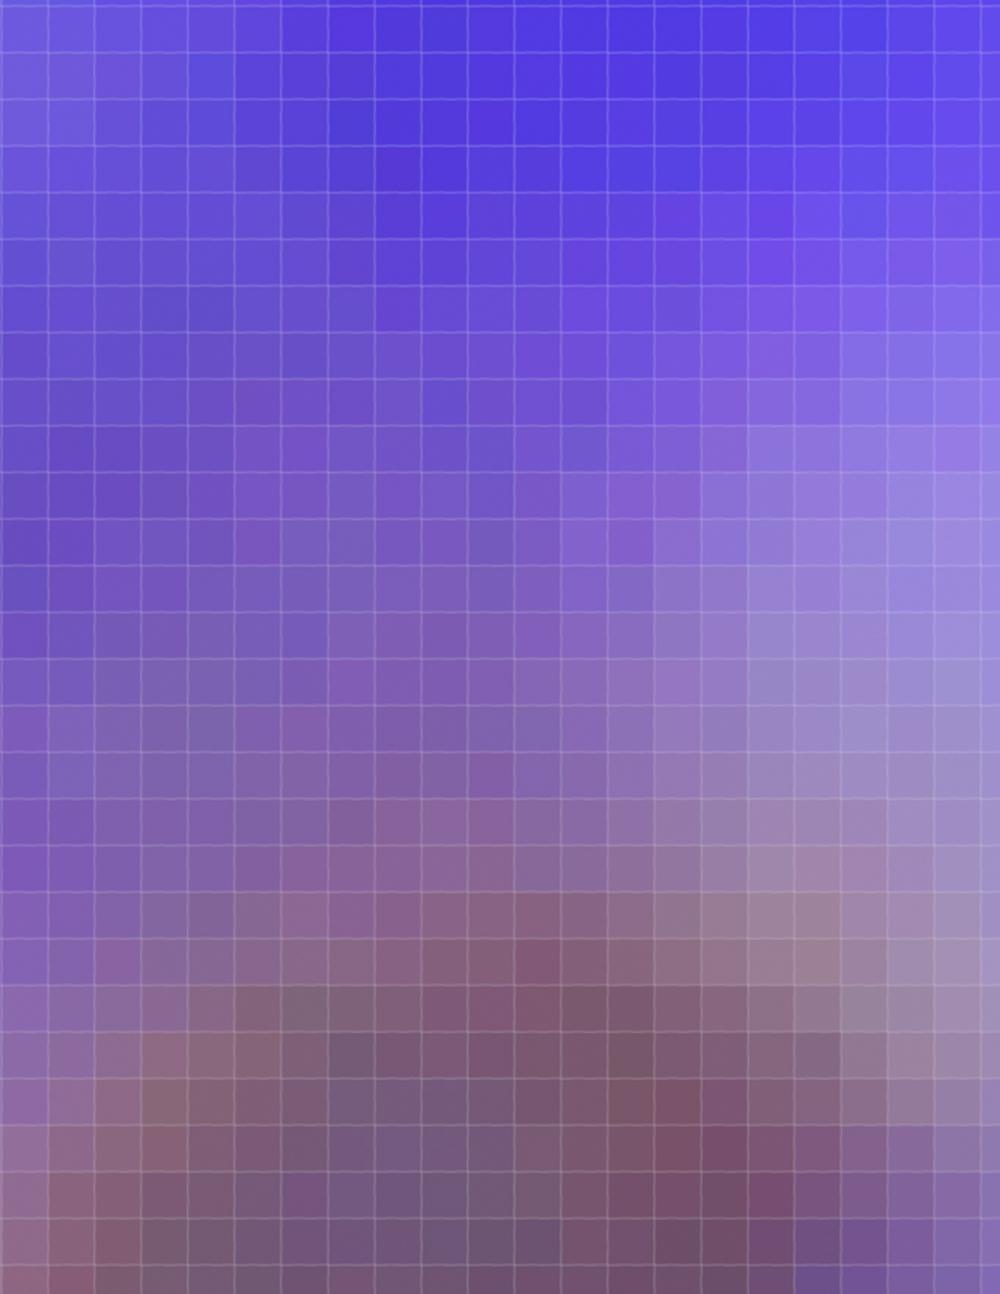 pixel7.jpg